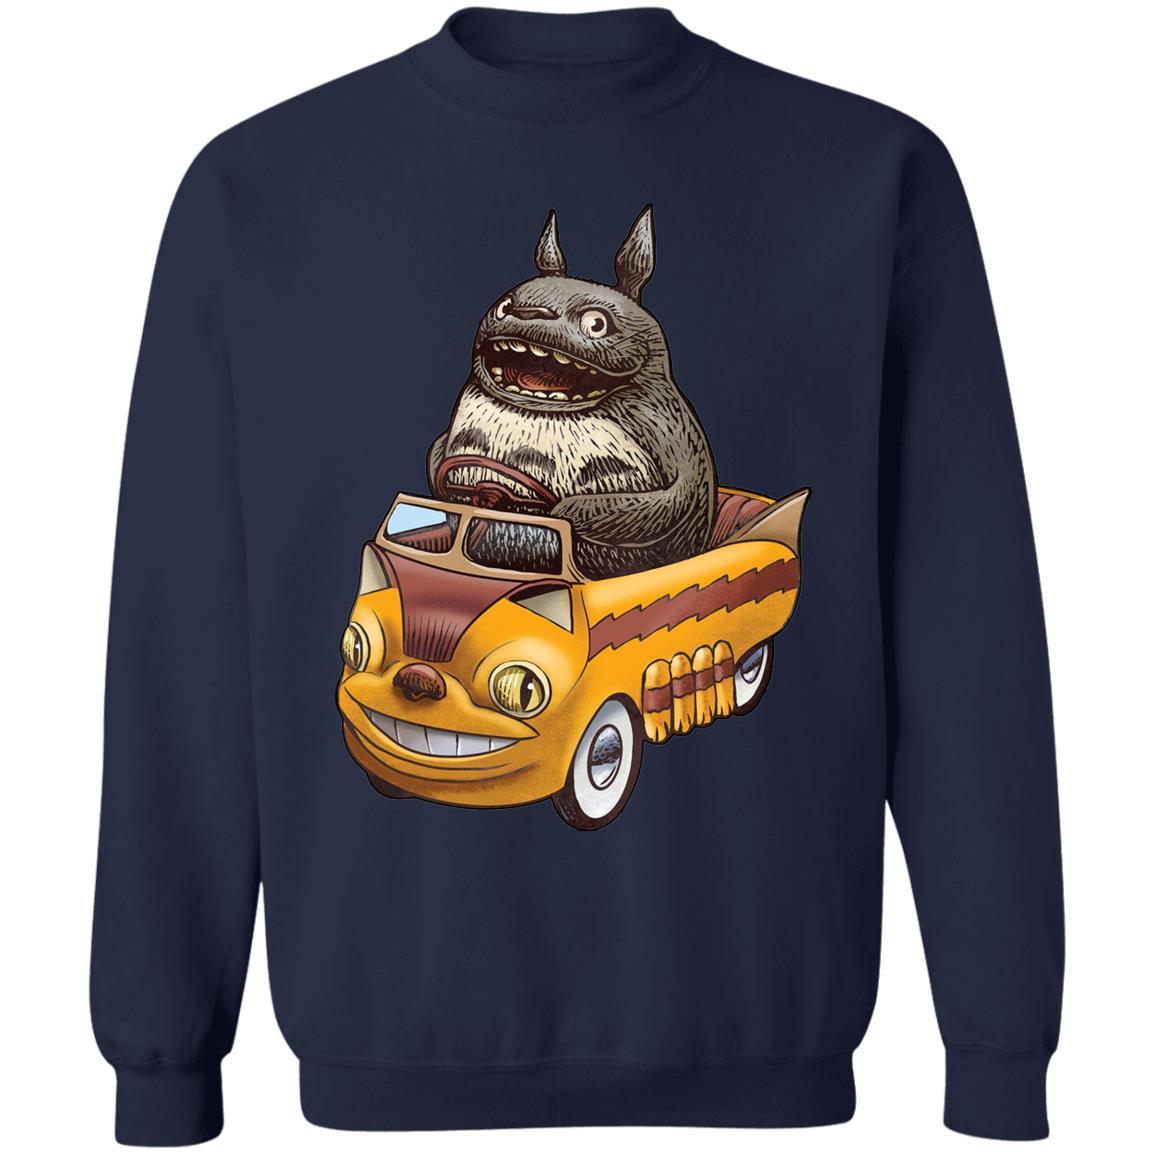 Totoro driving Batbus Sweatshirt